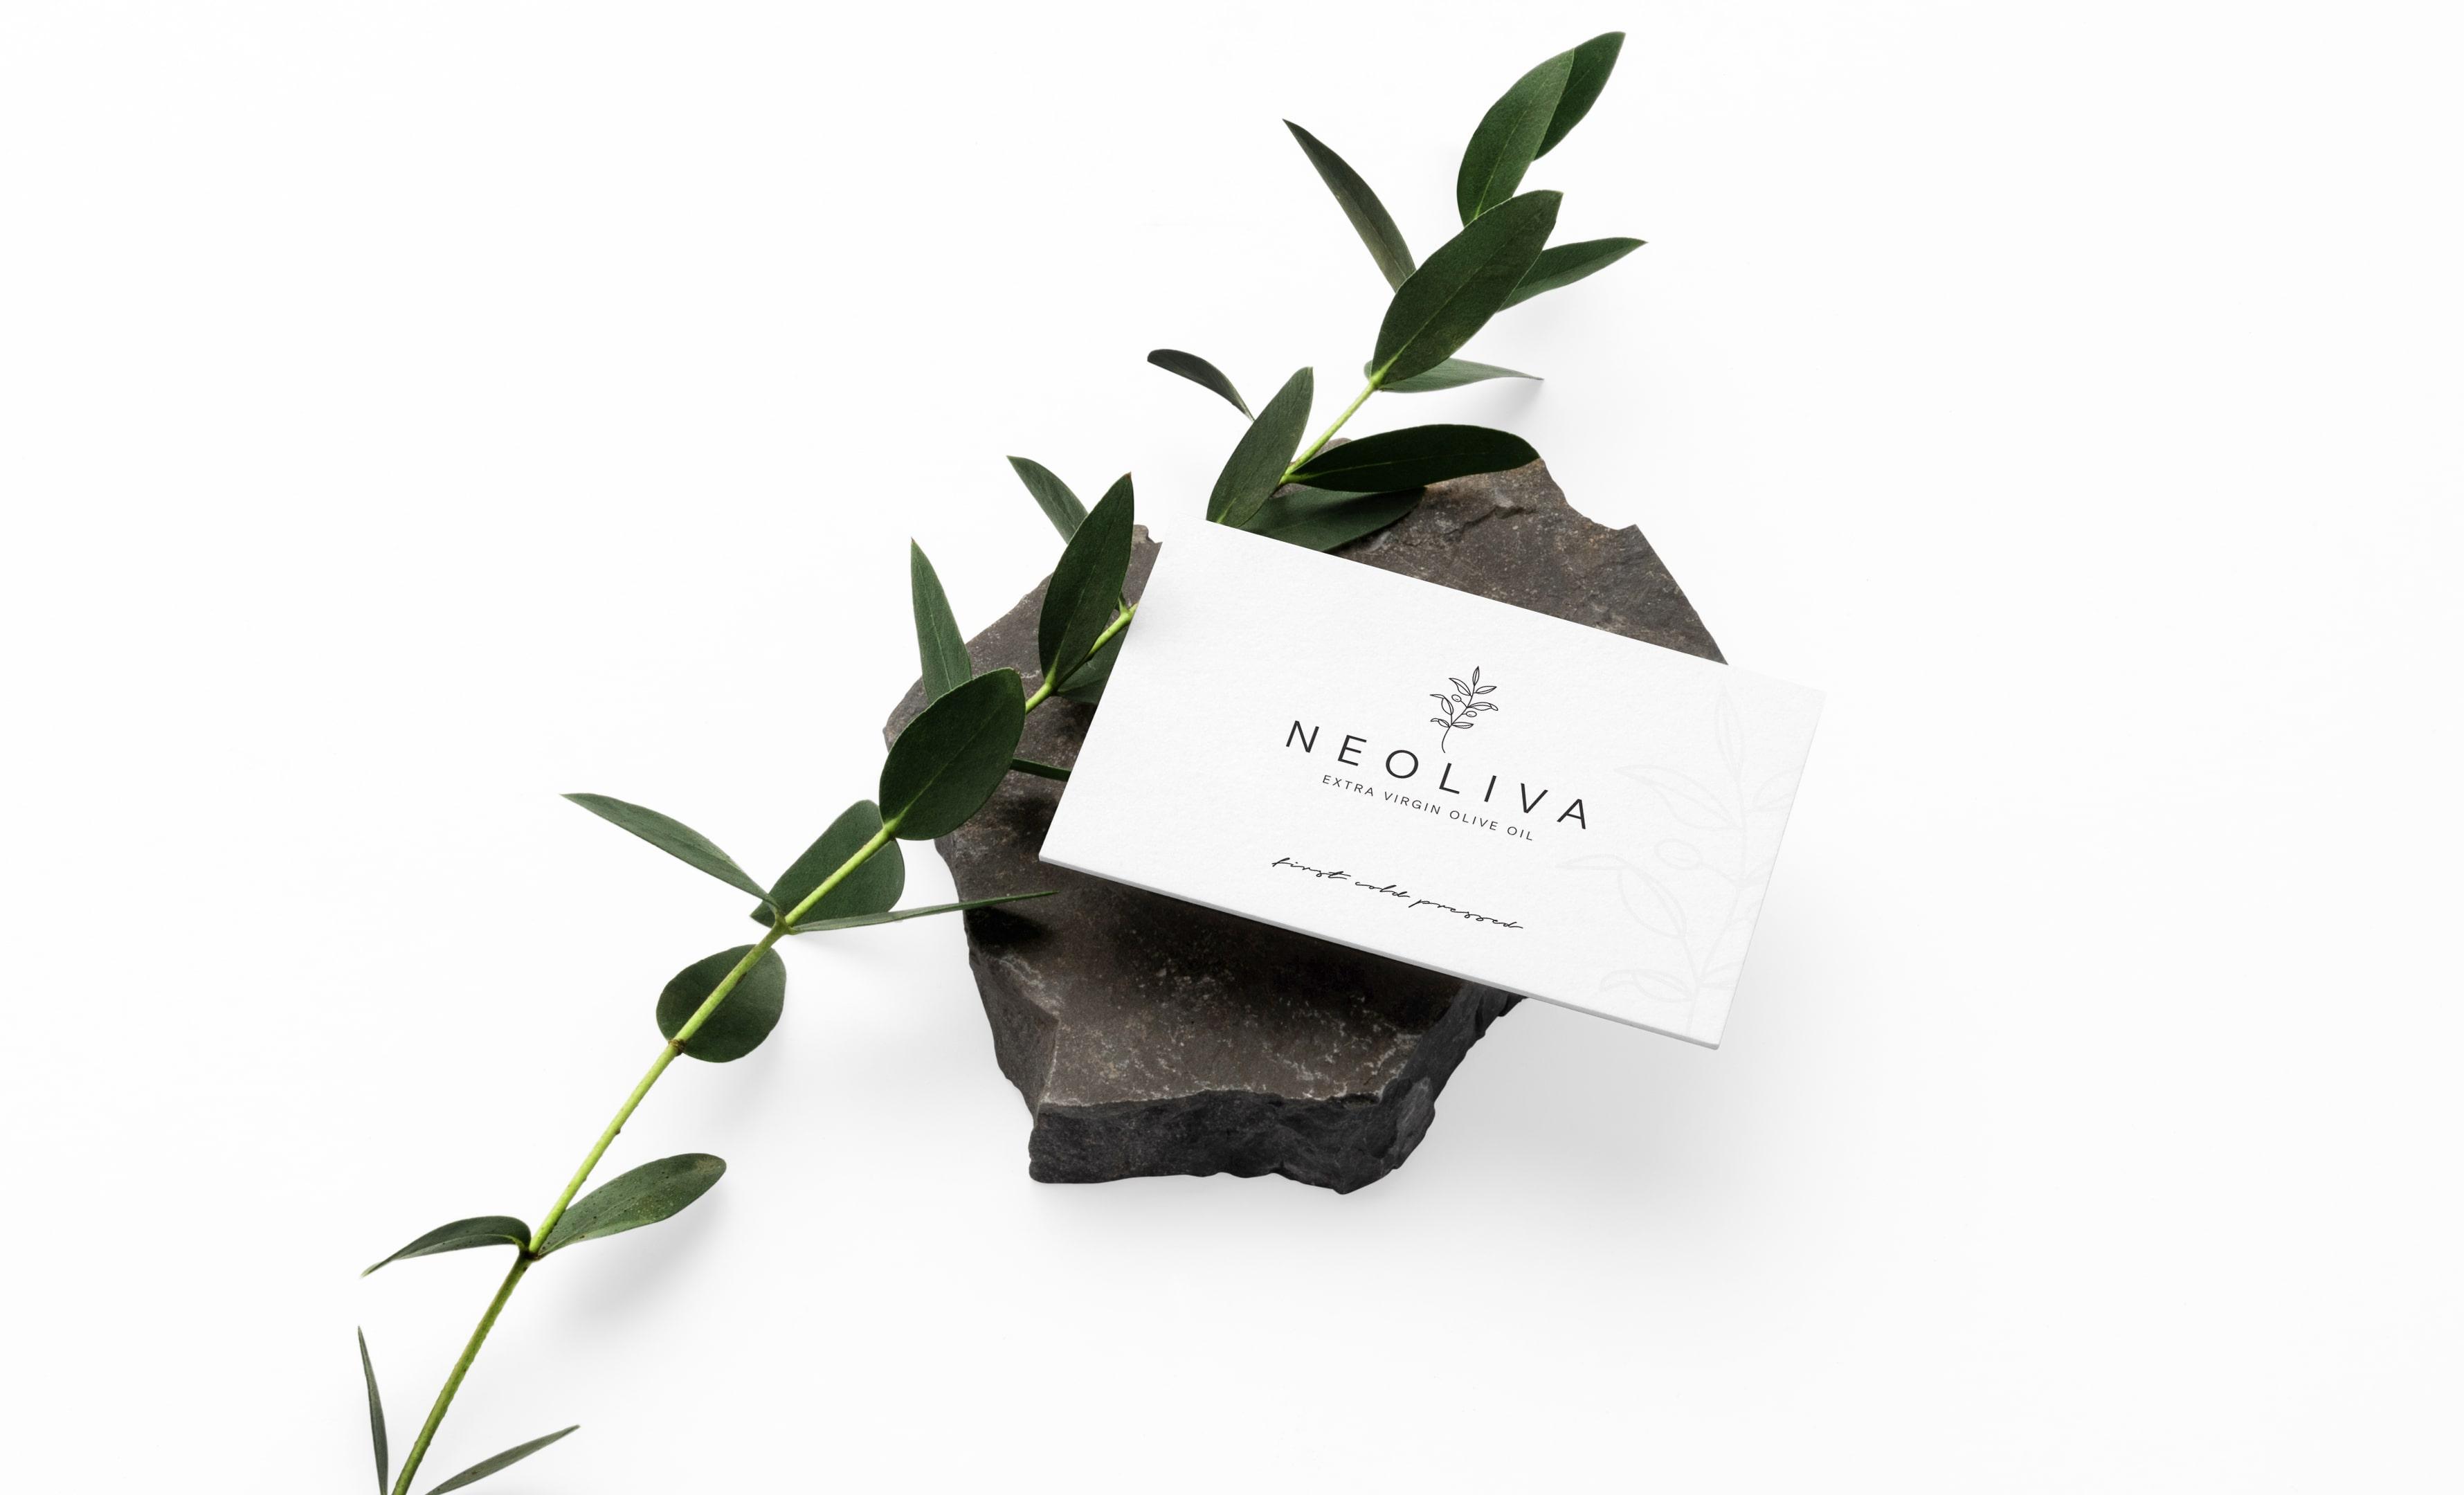 Neoliva-Gokten-Tut-Website-3